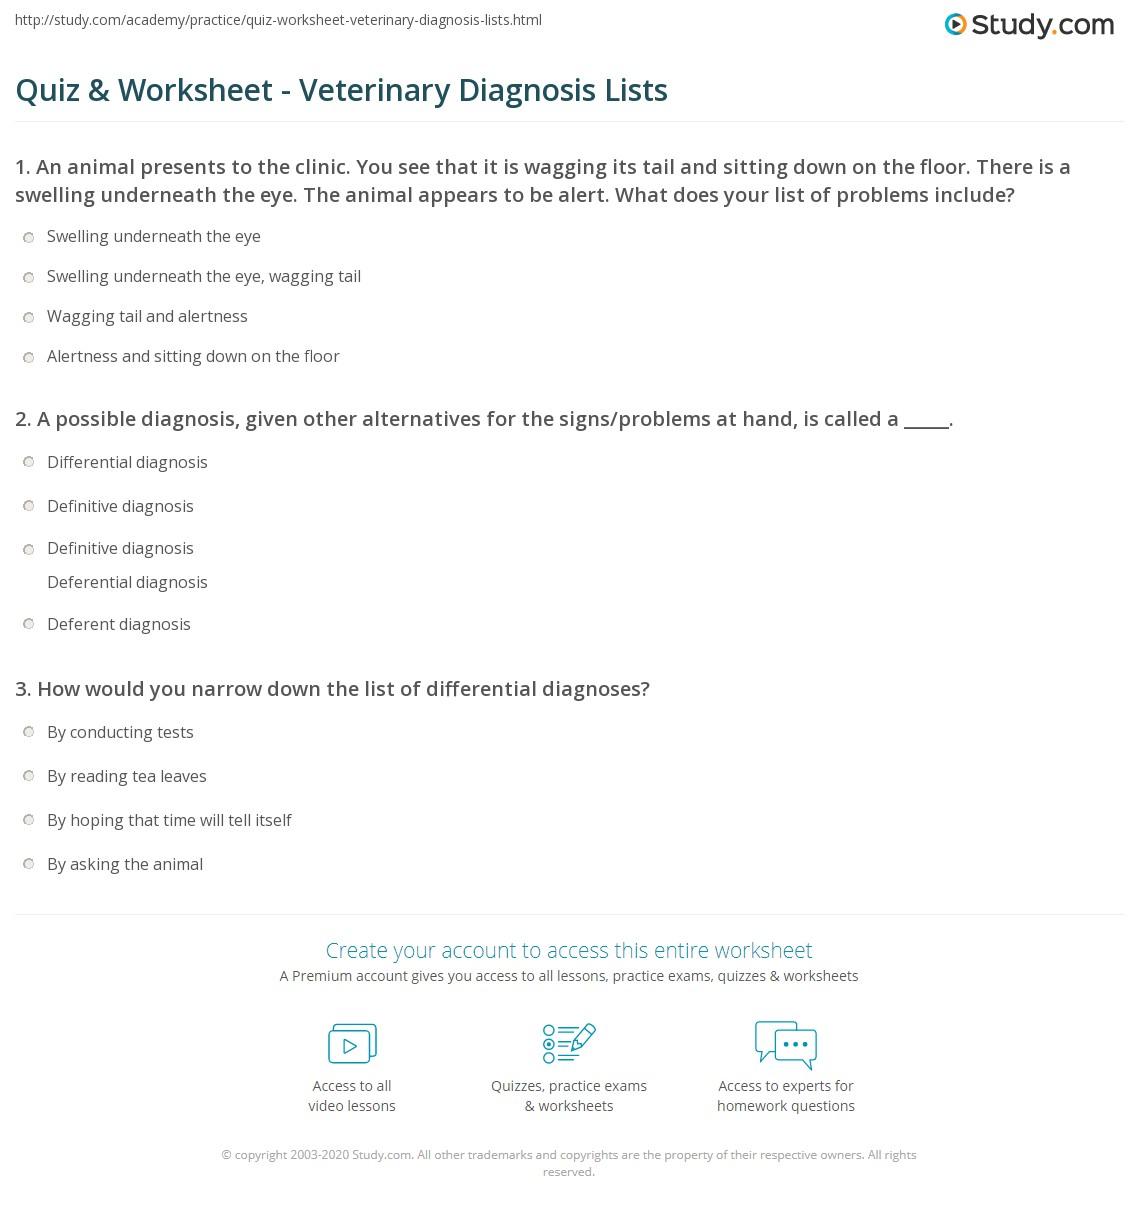 Quiz & Worksheet - Veterinary Diagnosis Lists | Study com